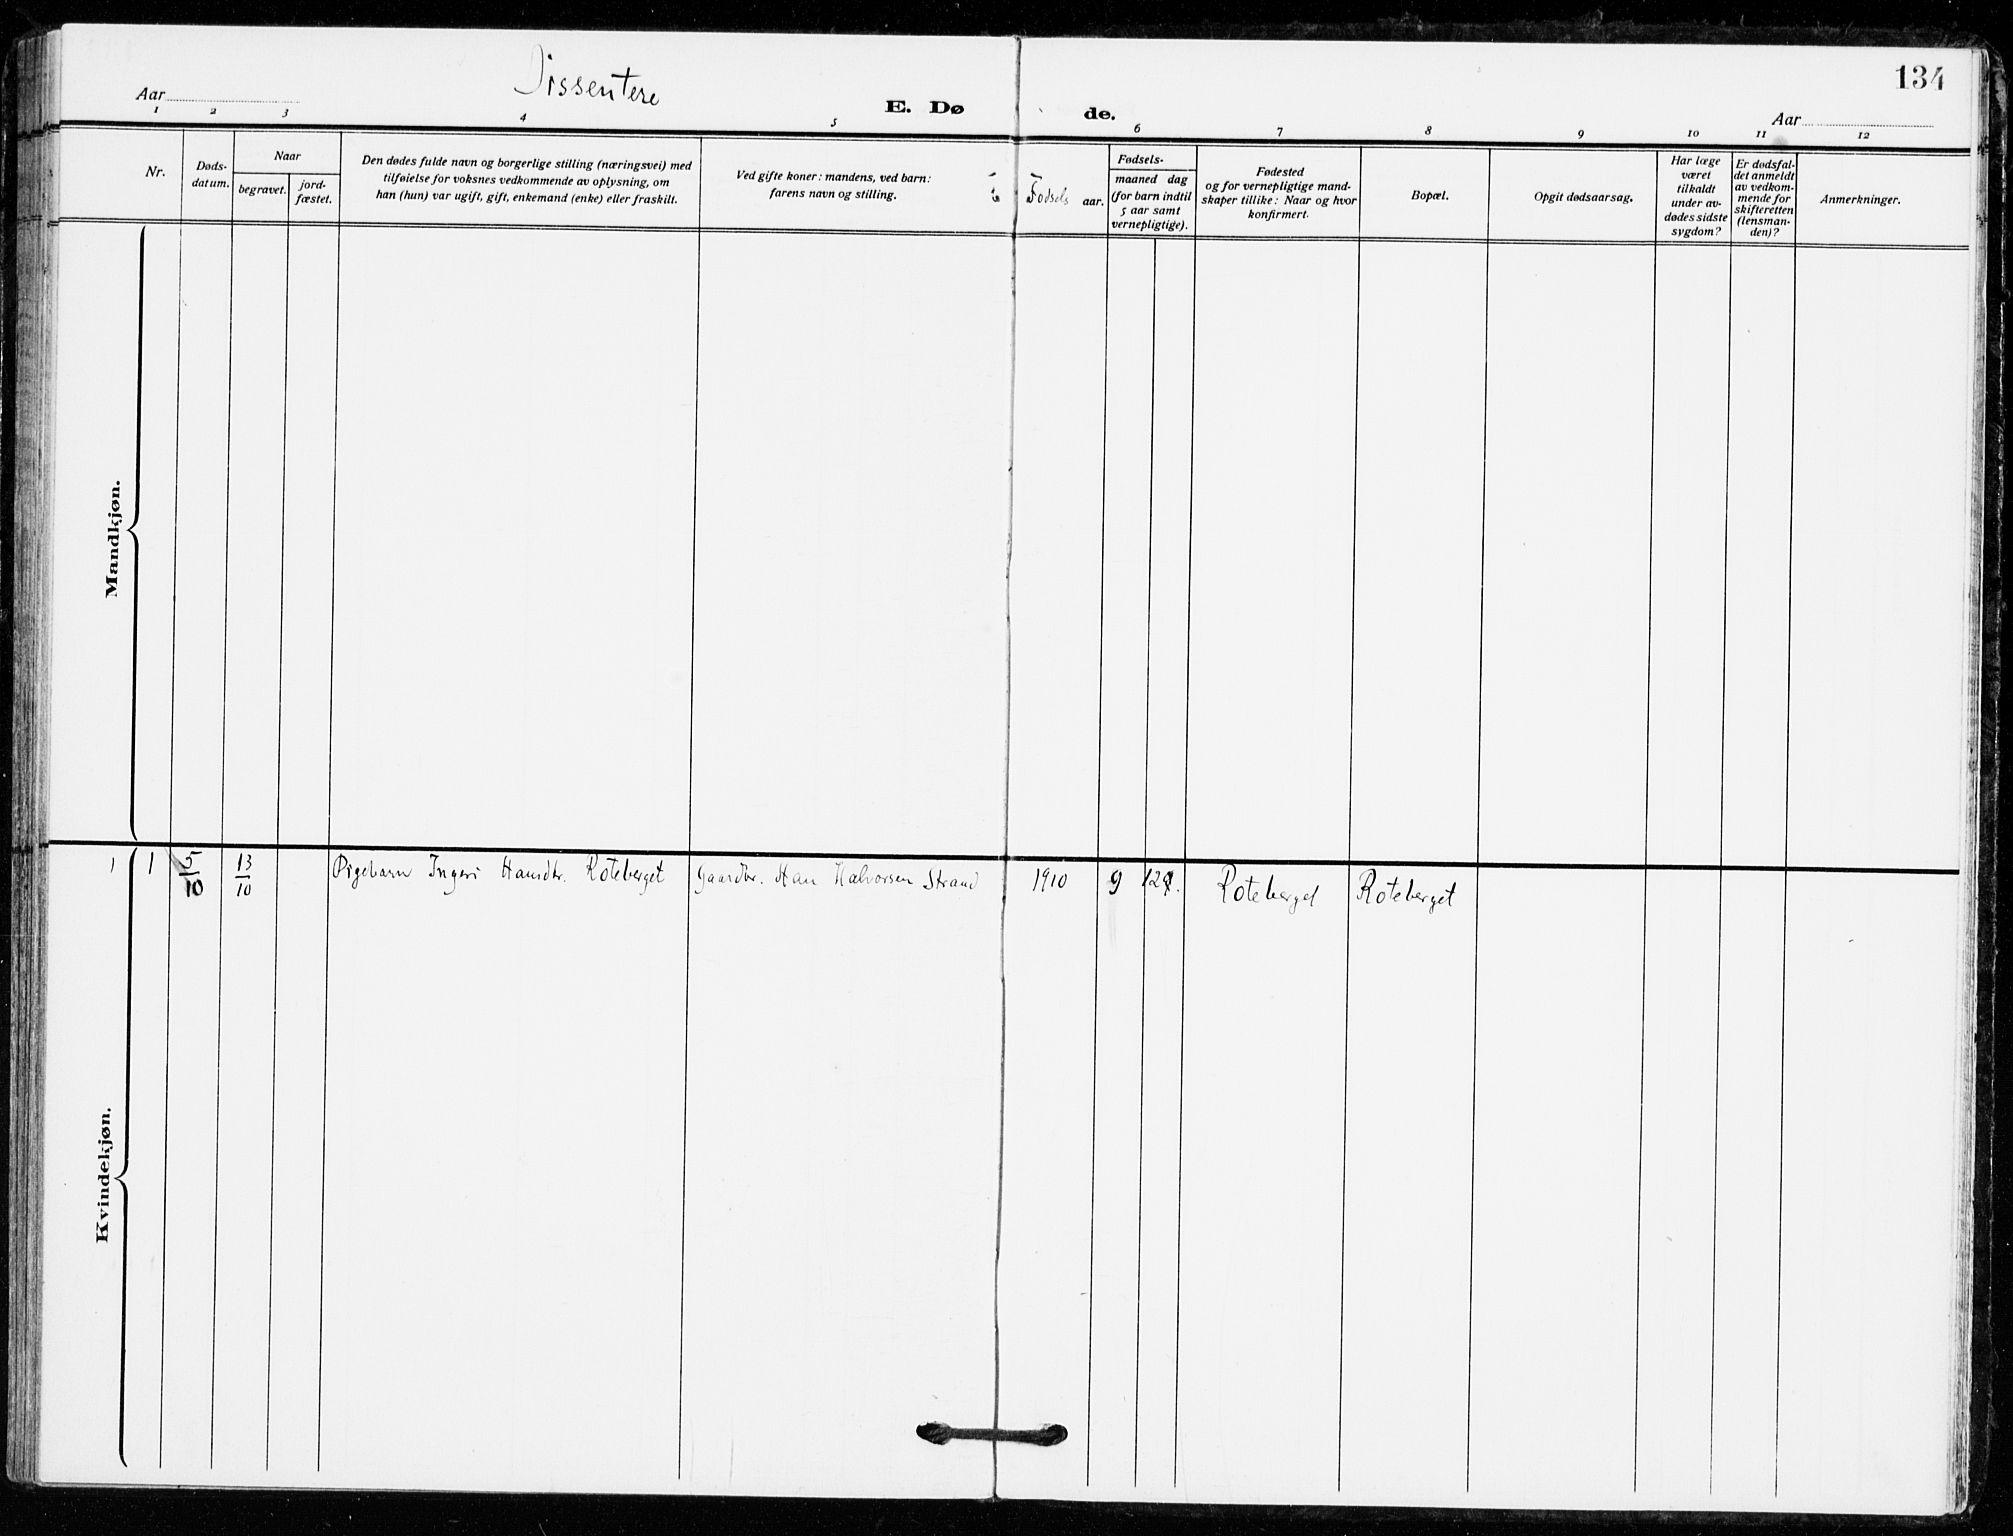 SAKO, Bø kirkebøker, F/Fa/L0013: Parish register (official) no. 13, 1909-1921, p. 134